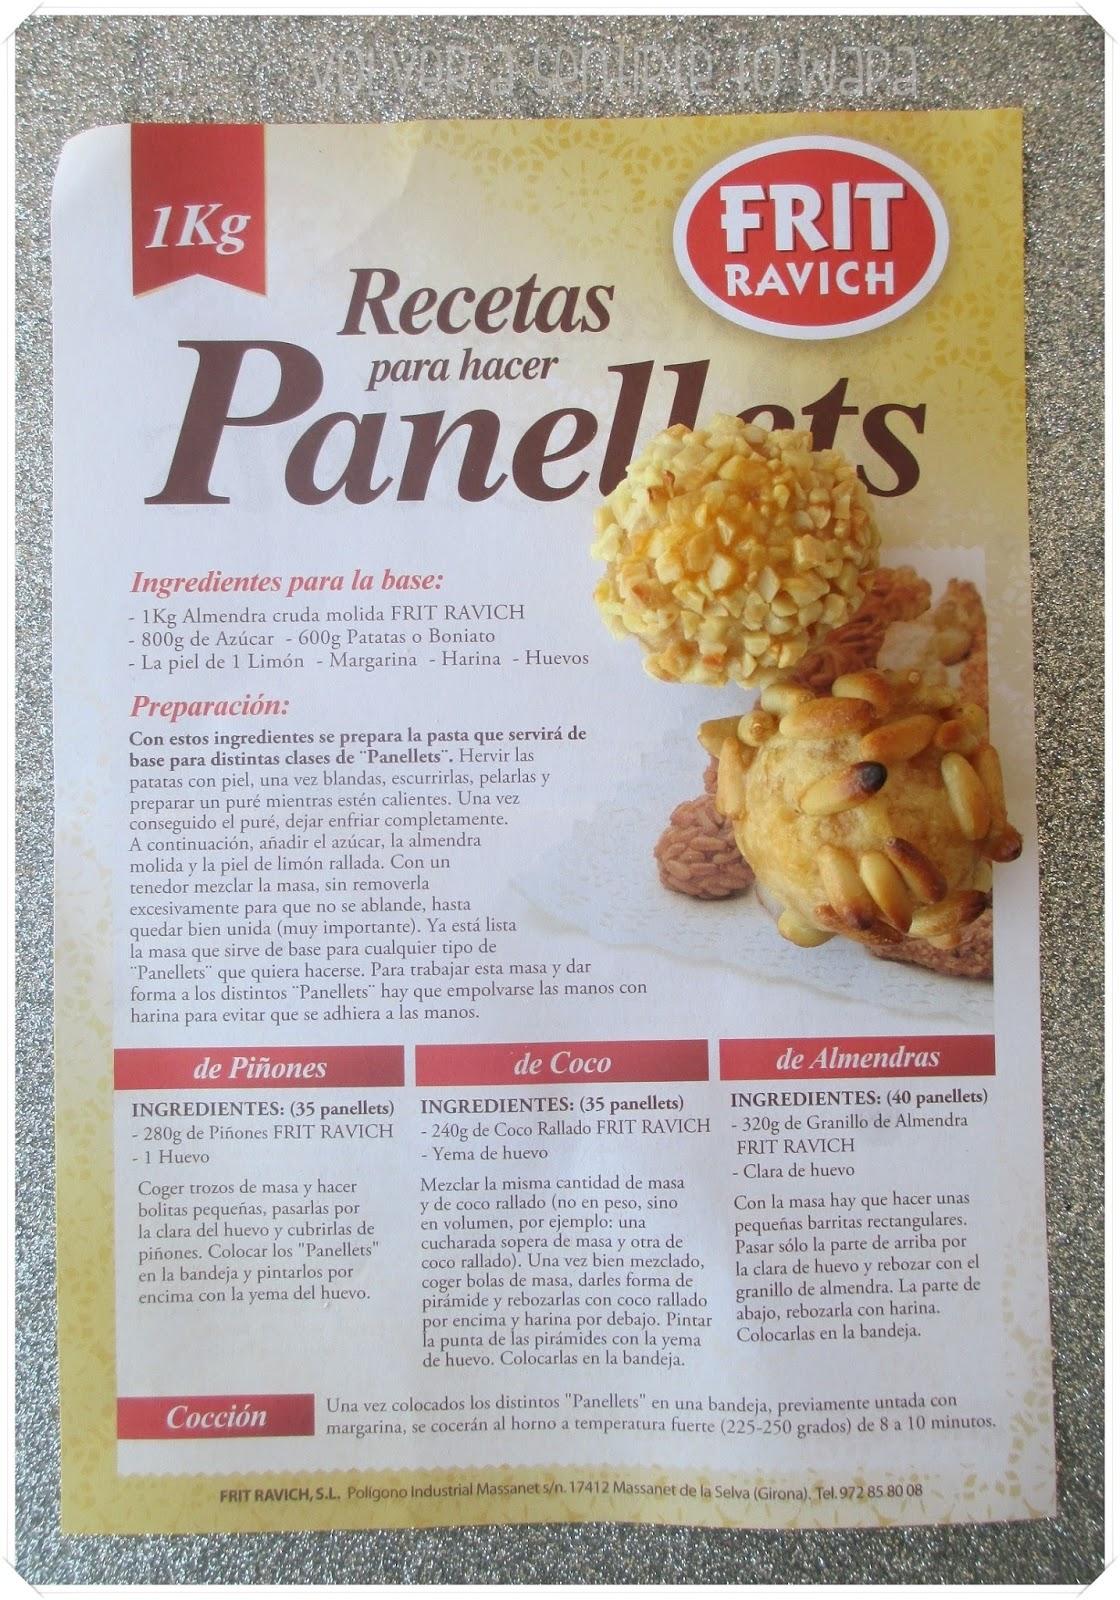 Receta: como hacer PANALLETS caseros de batata {paso a paso}